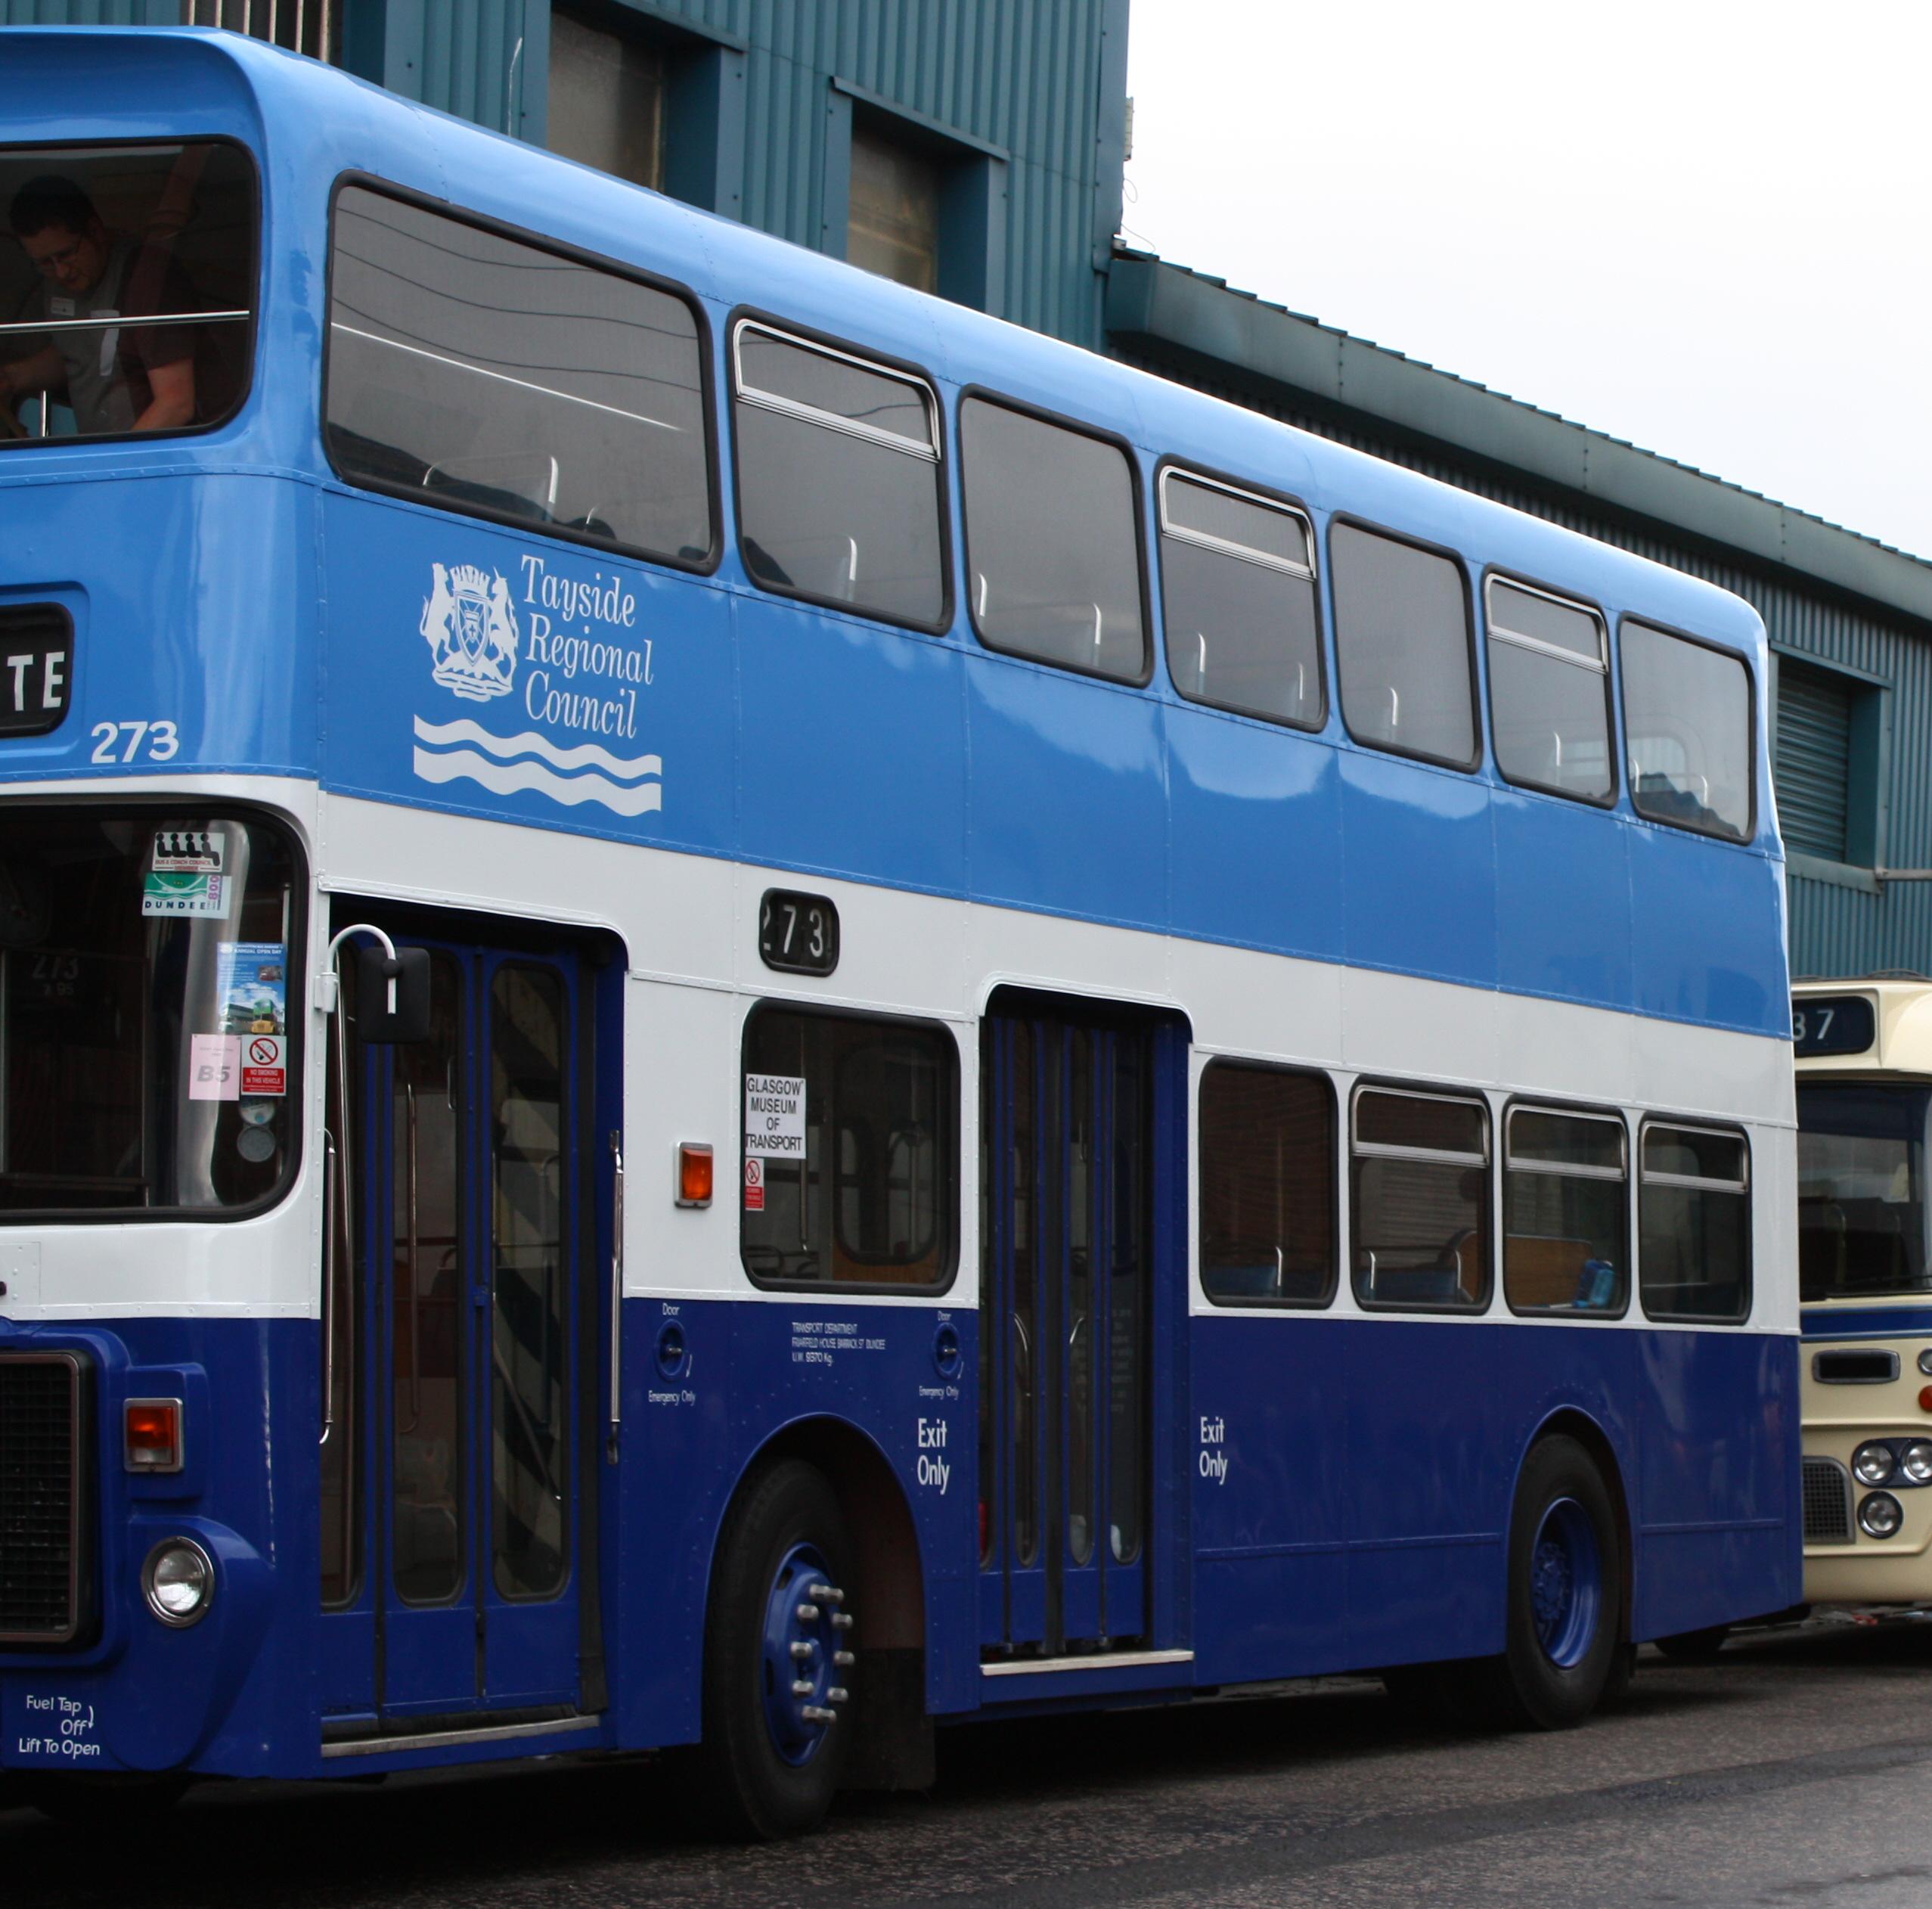 File:Preserved Tayside Regional Council bus 273 (WTS 276T) 1979 Volvo Ailsa B55 Alexander AV ...